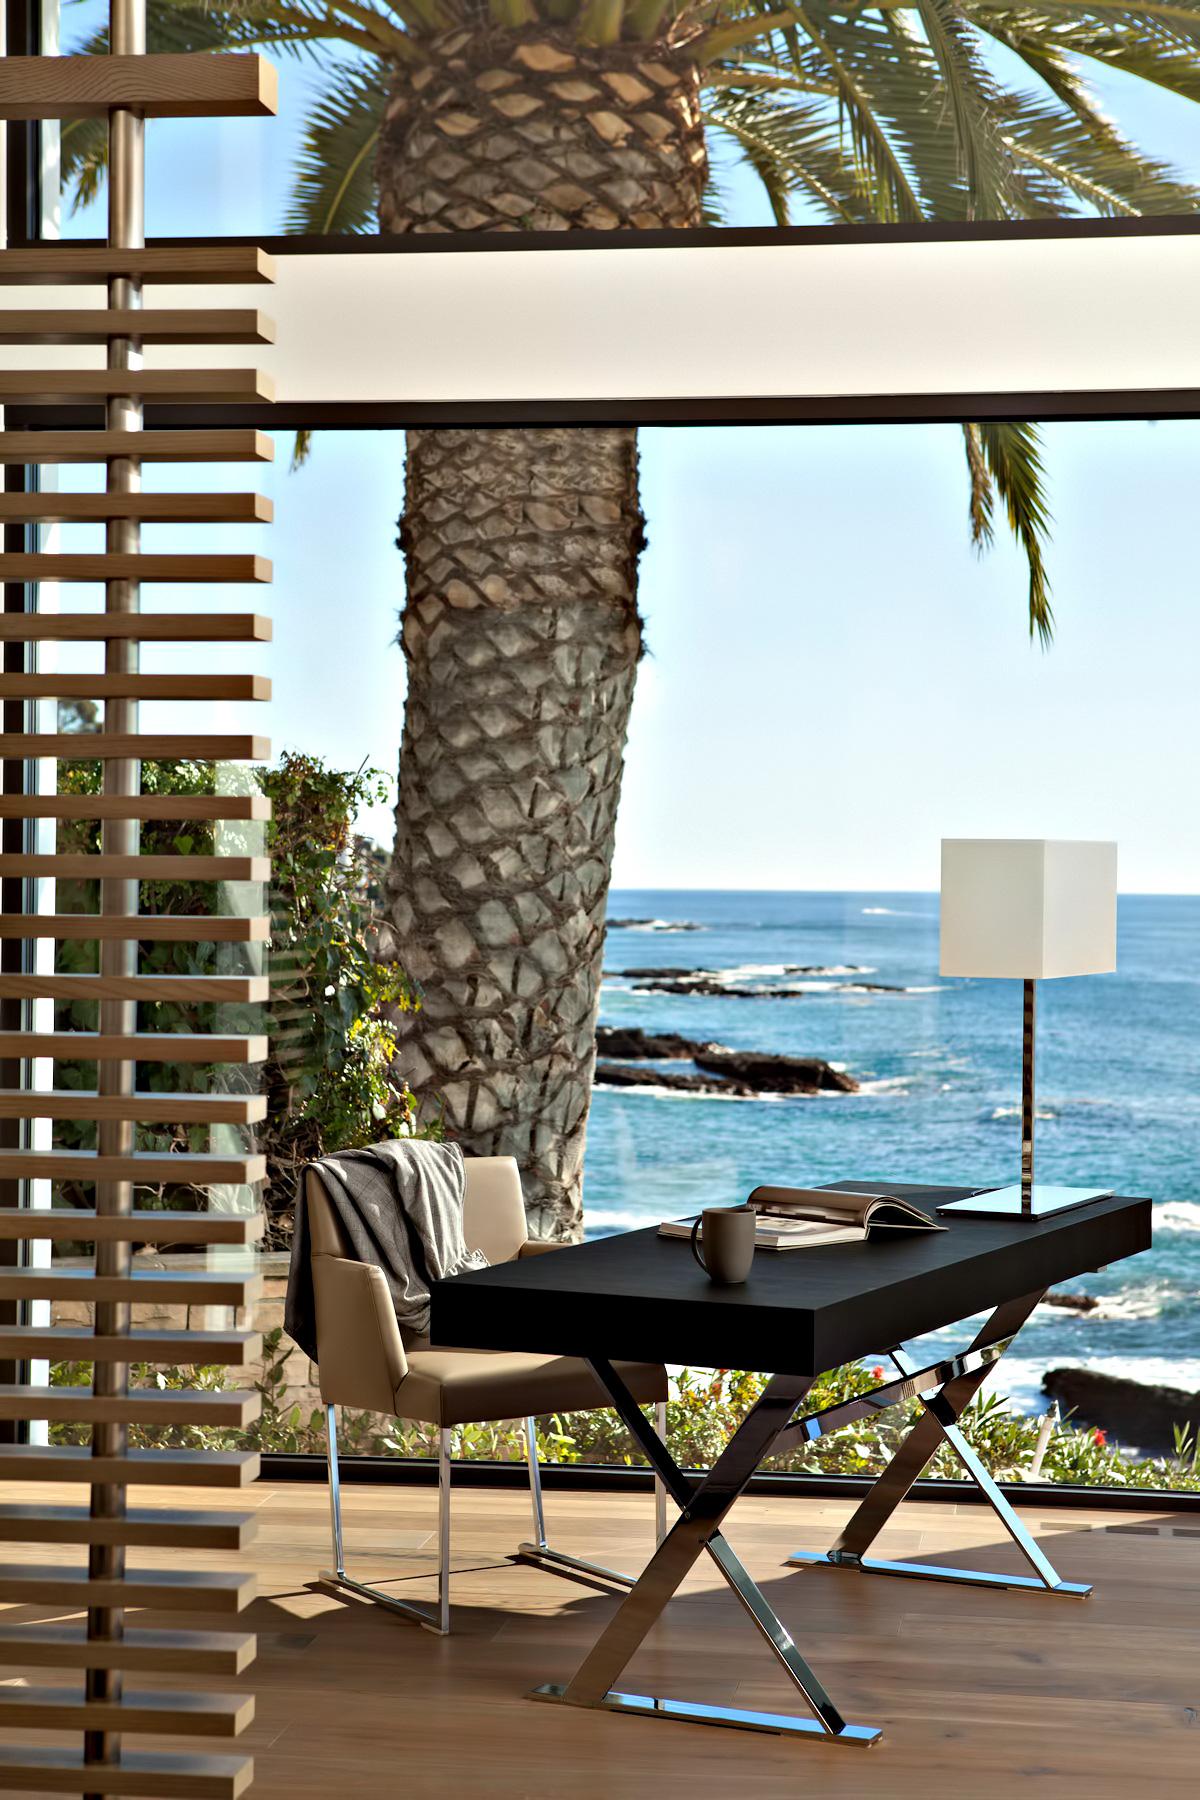 Rockledge Luxury Residence – 2317 S Coast Hwy, Laguna Beach, CA, USA